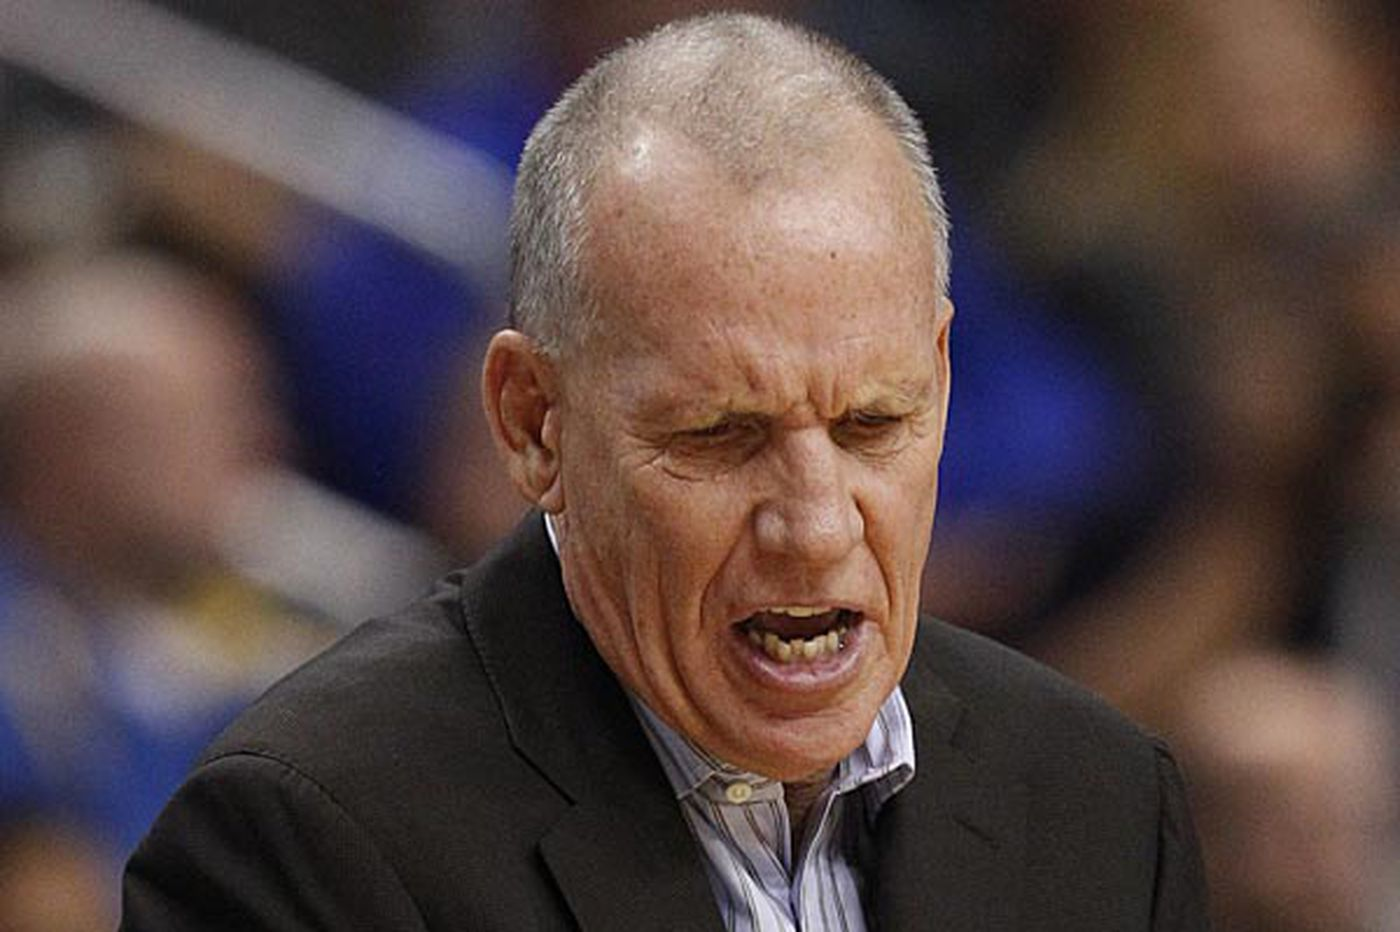 76ers coach Doug Collins misses sub-stantial contributions